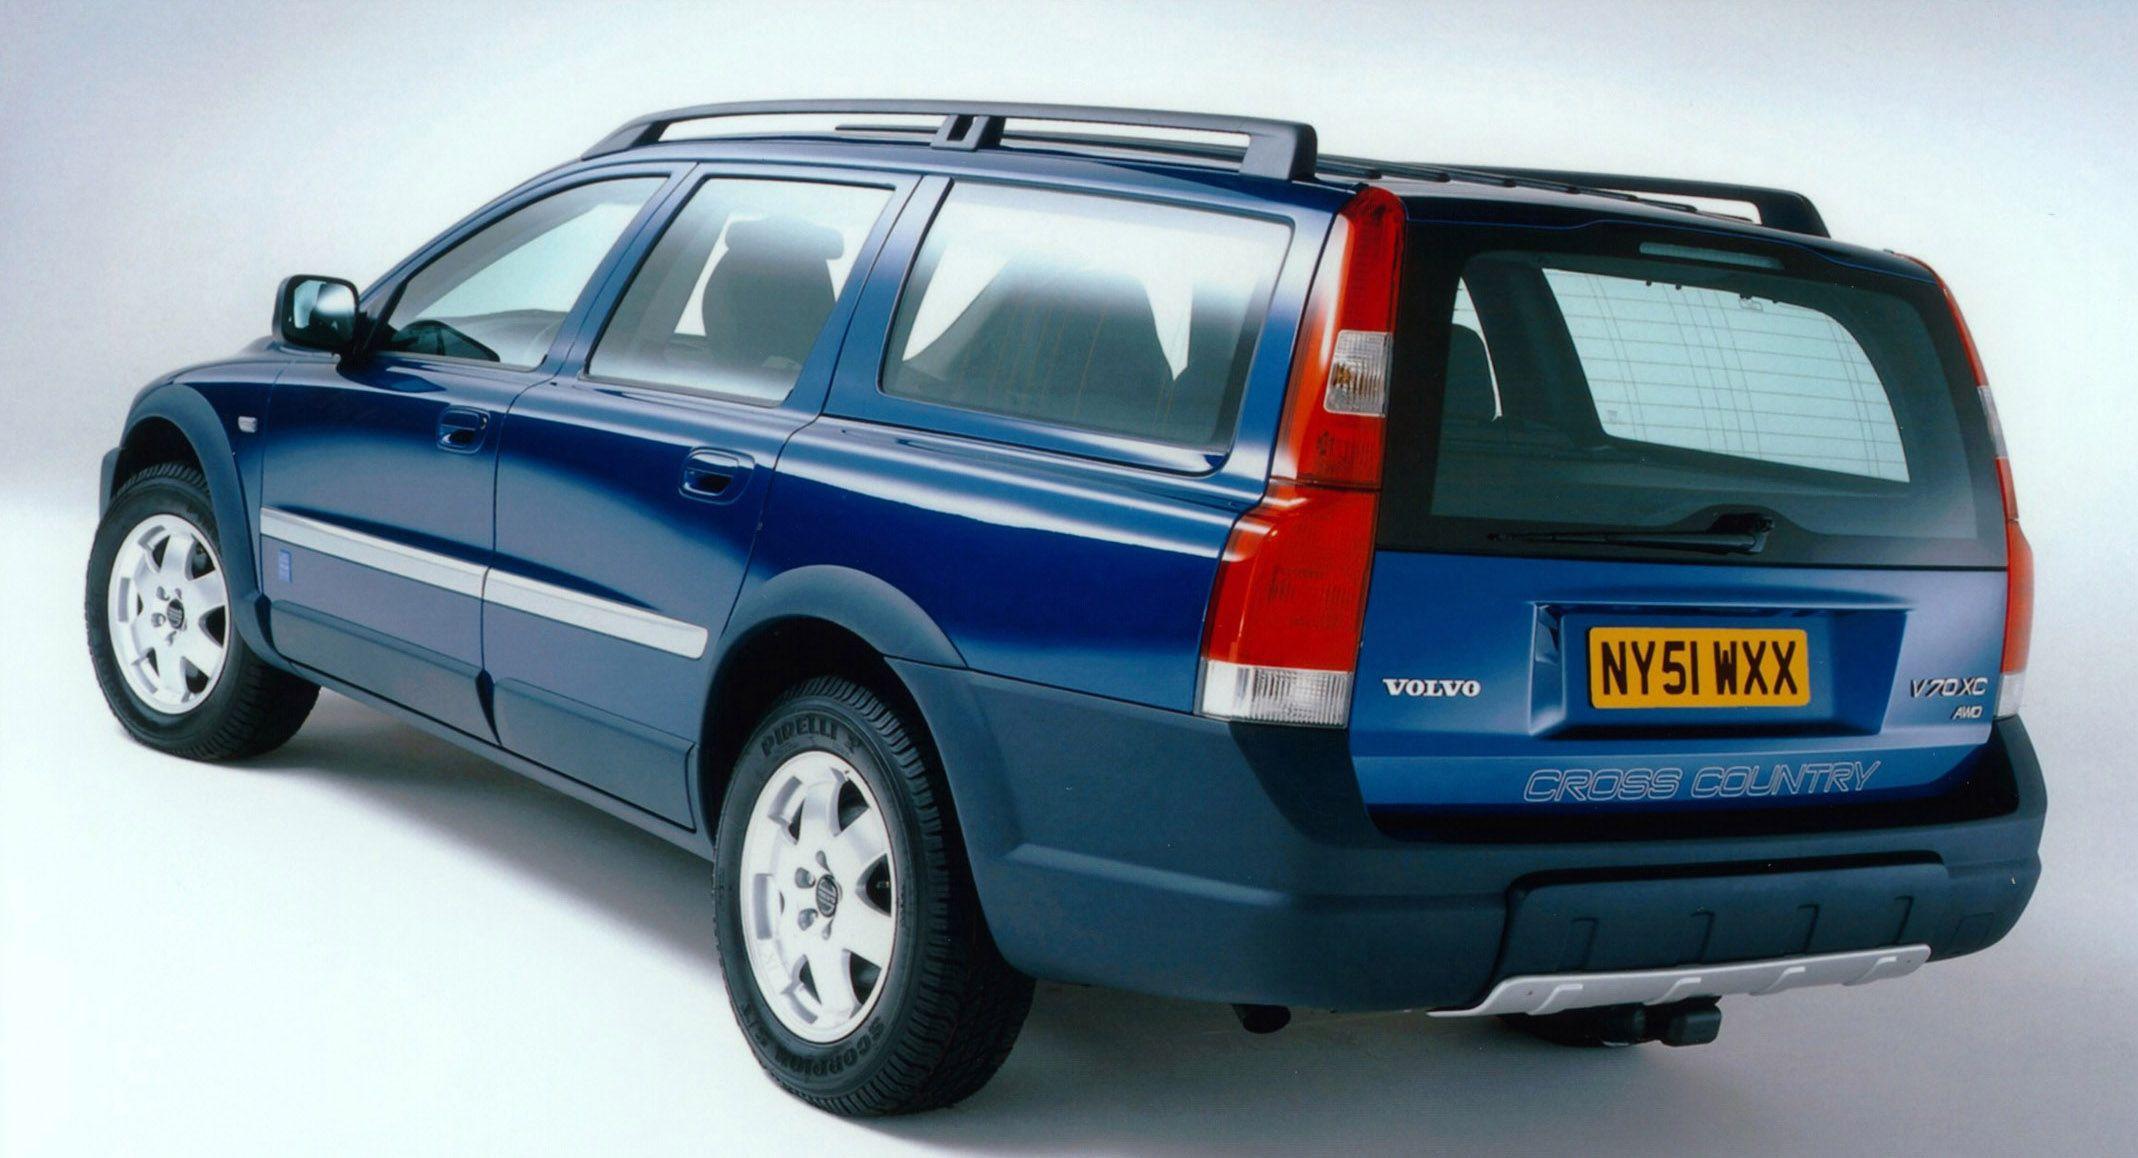 Volvo v70 xc cross country ocean race edition 2001